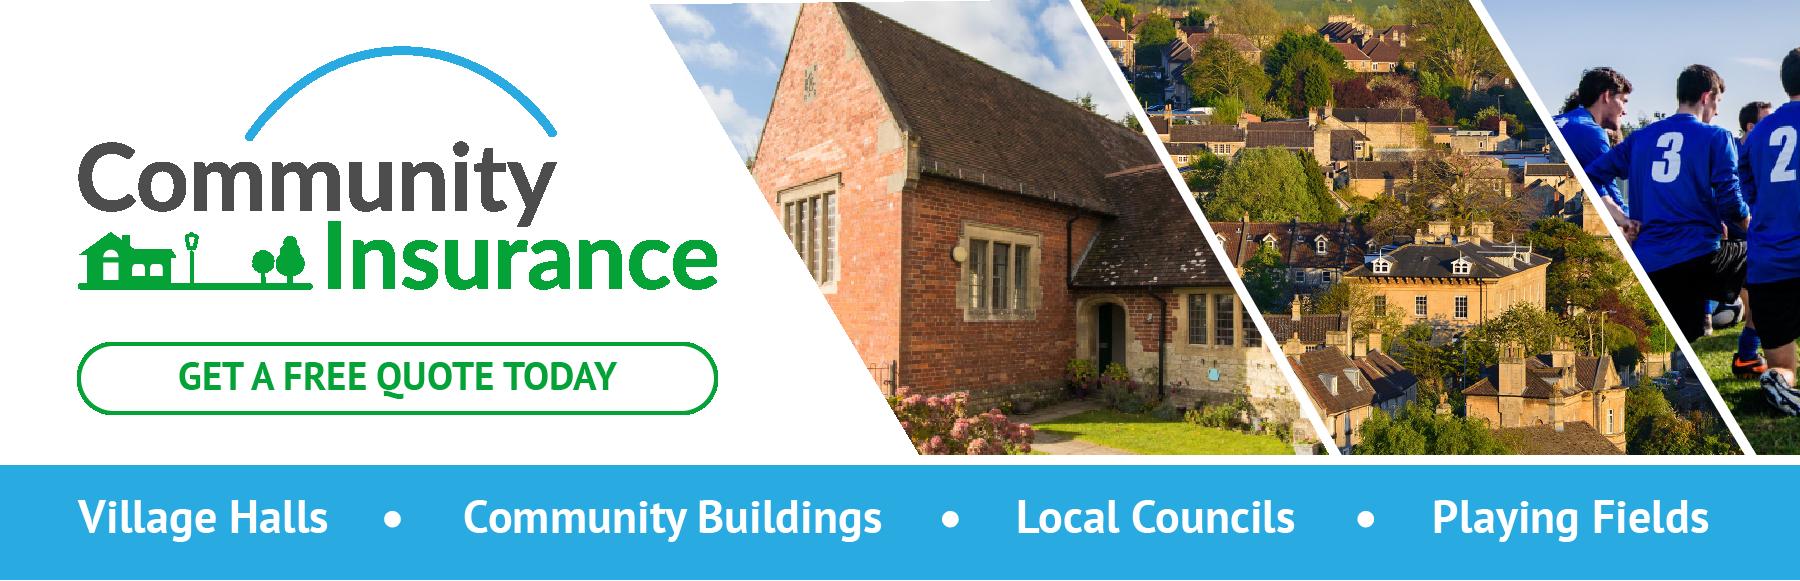 Village Hall Insurance Banner